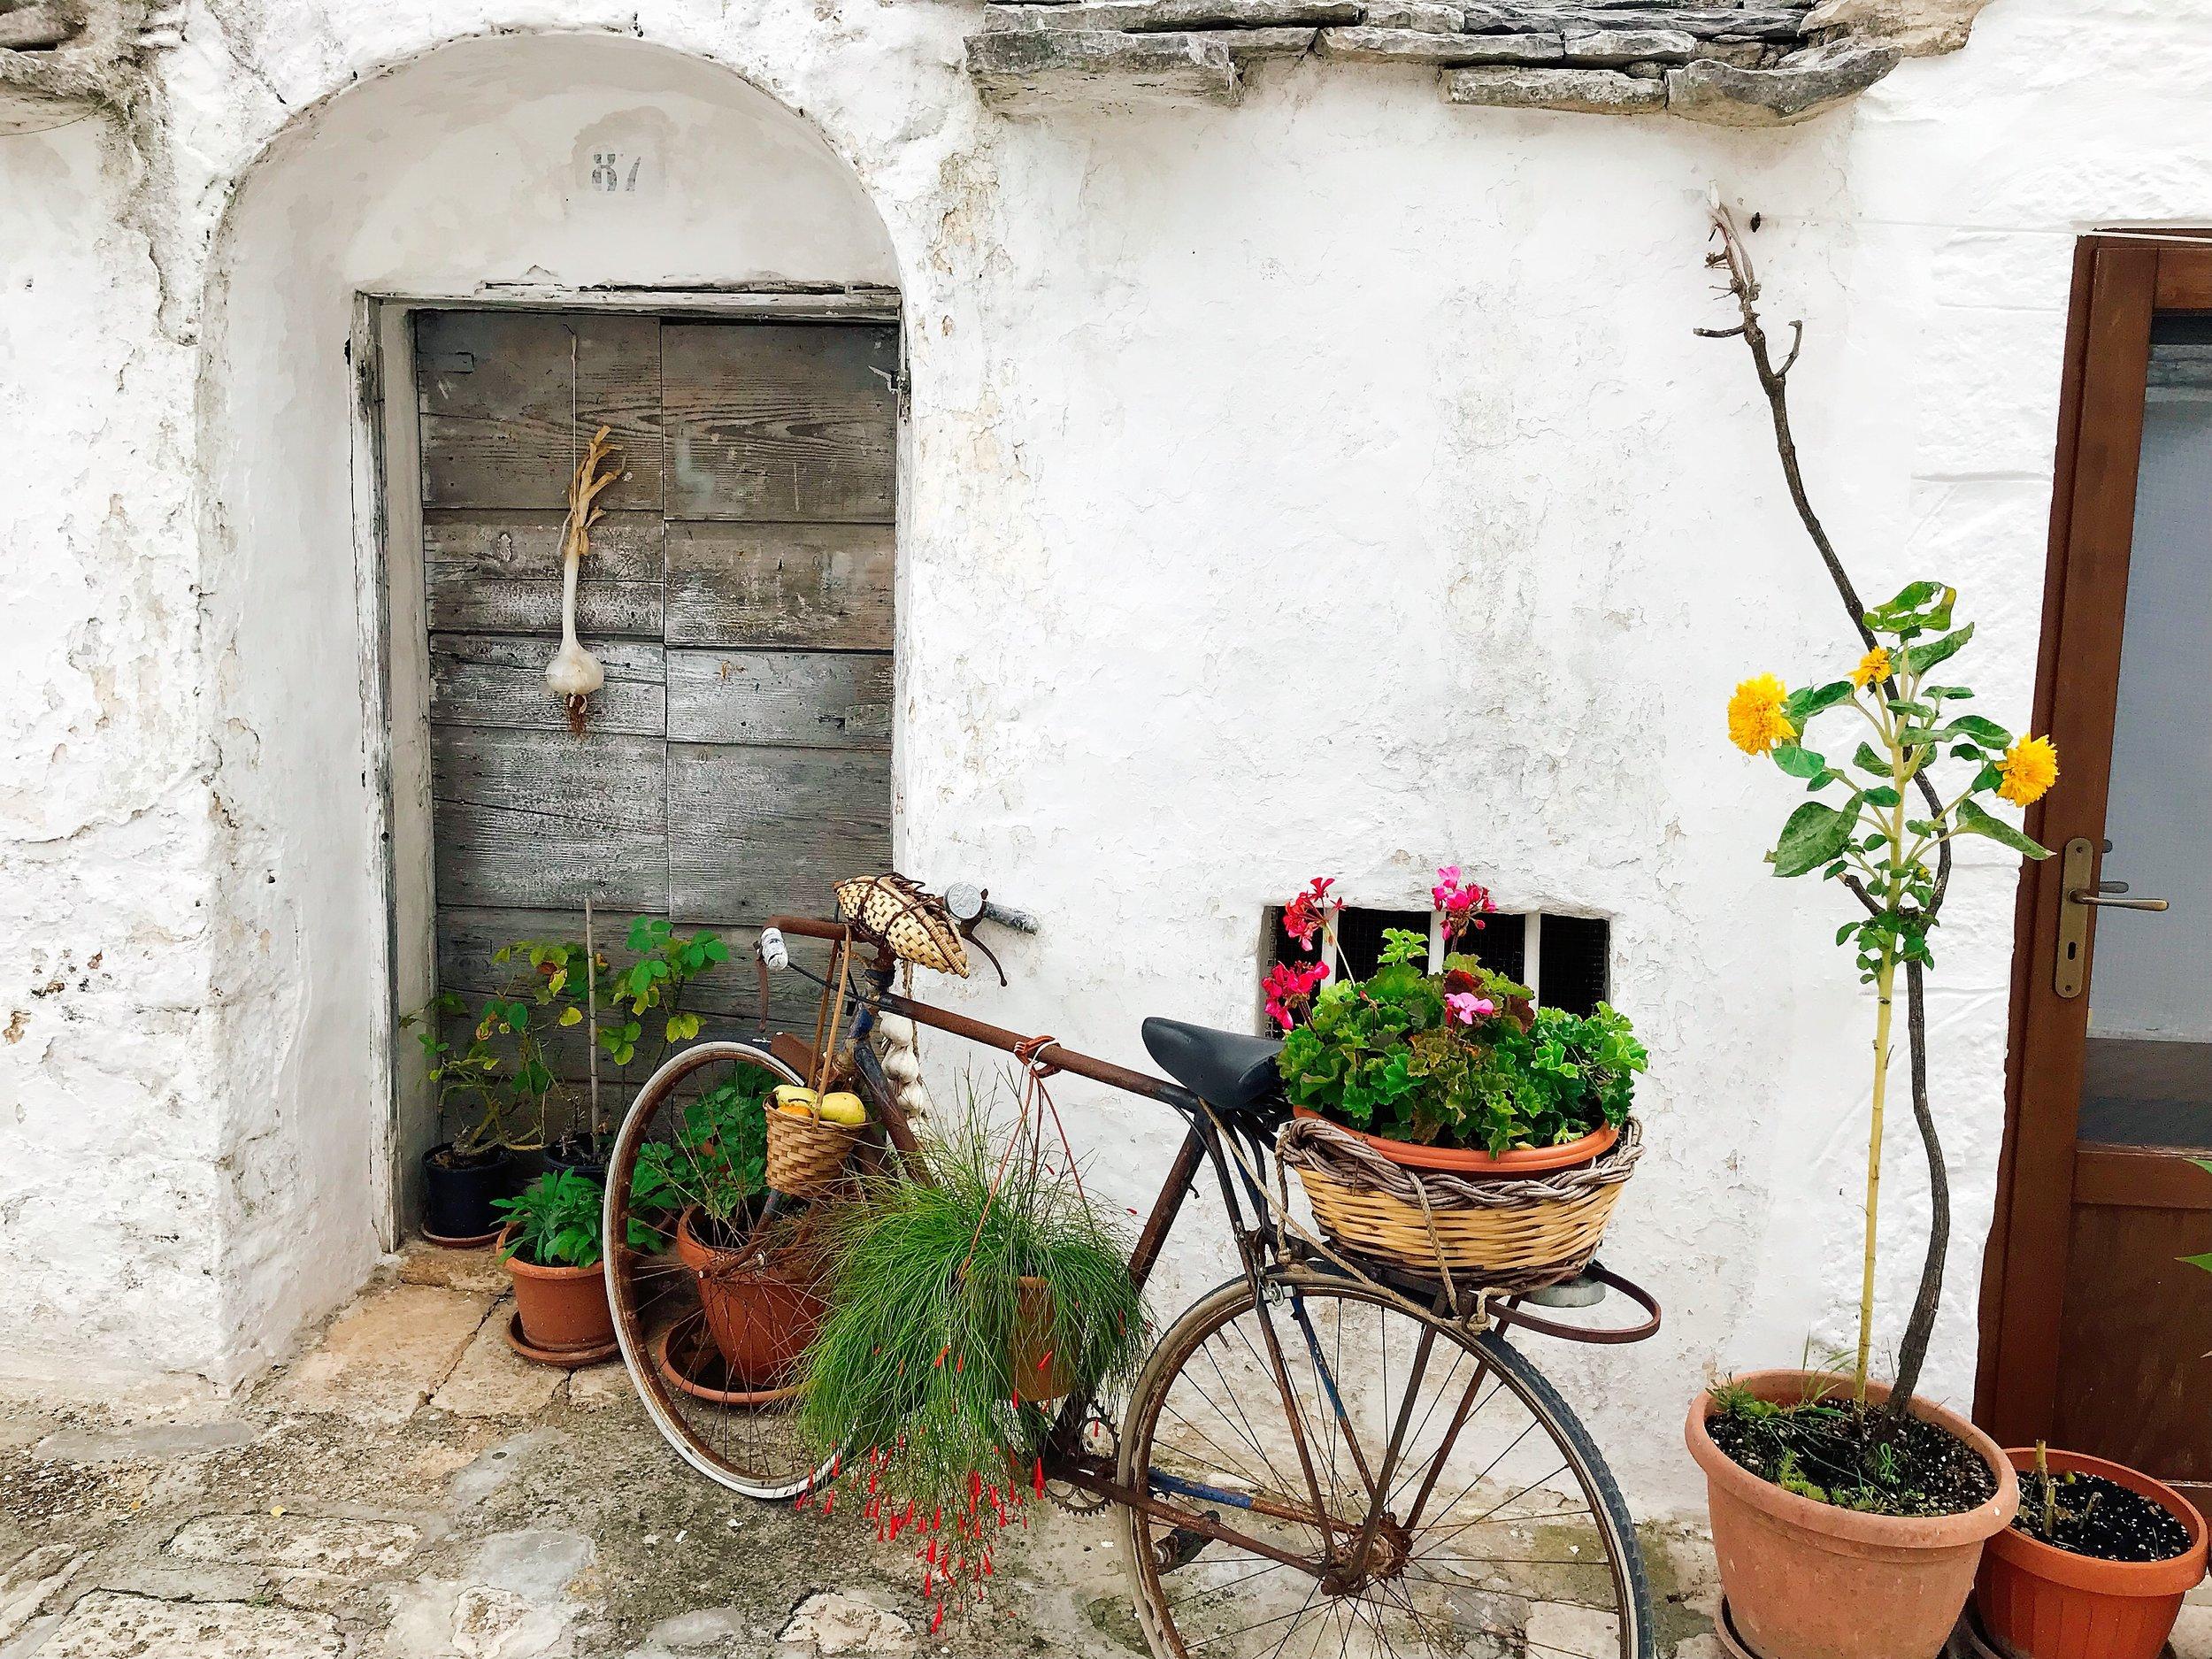 Alberobello- Isn't their house the absolute cutest?